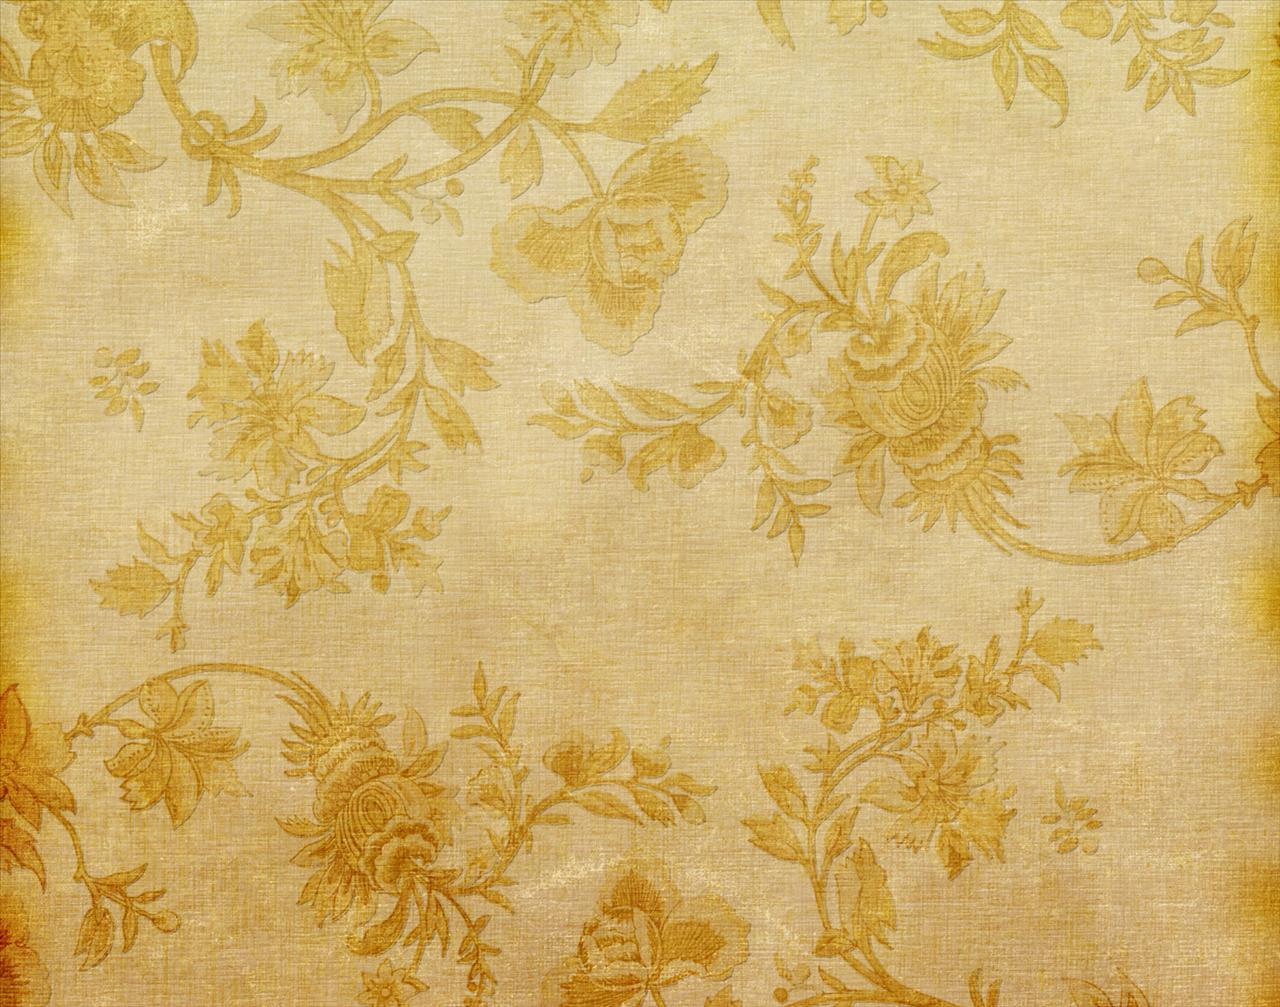 edgar allan poe yellow wallpaper